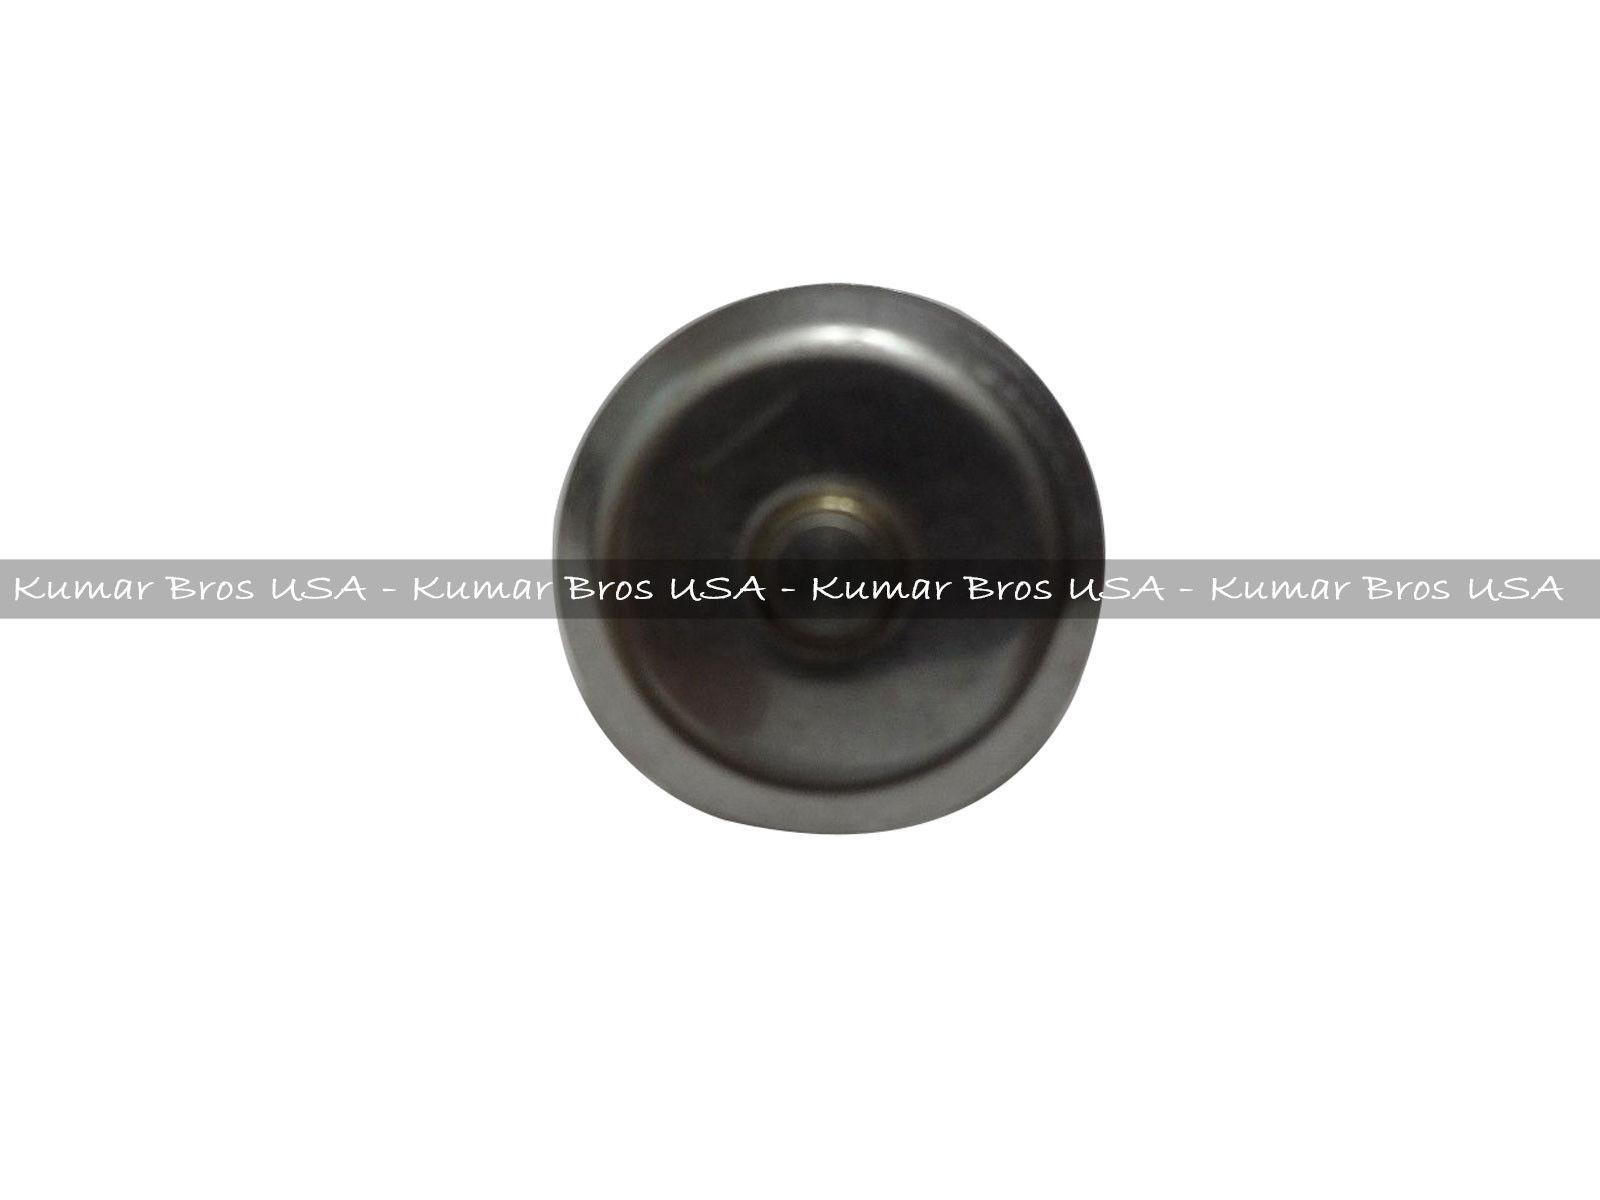 New Kumar Bros USA Thermostat /& Gasket For Bobcat 743 160°F